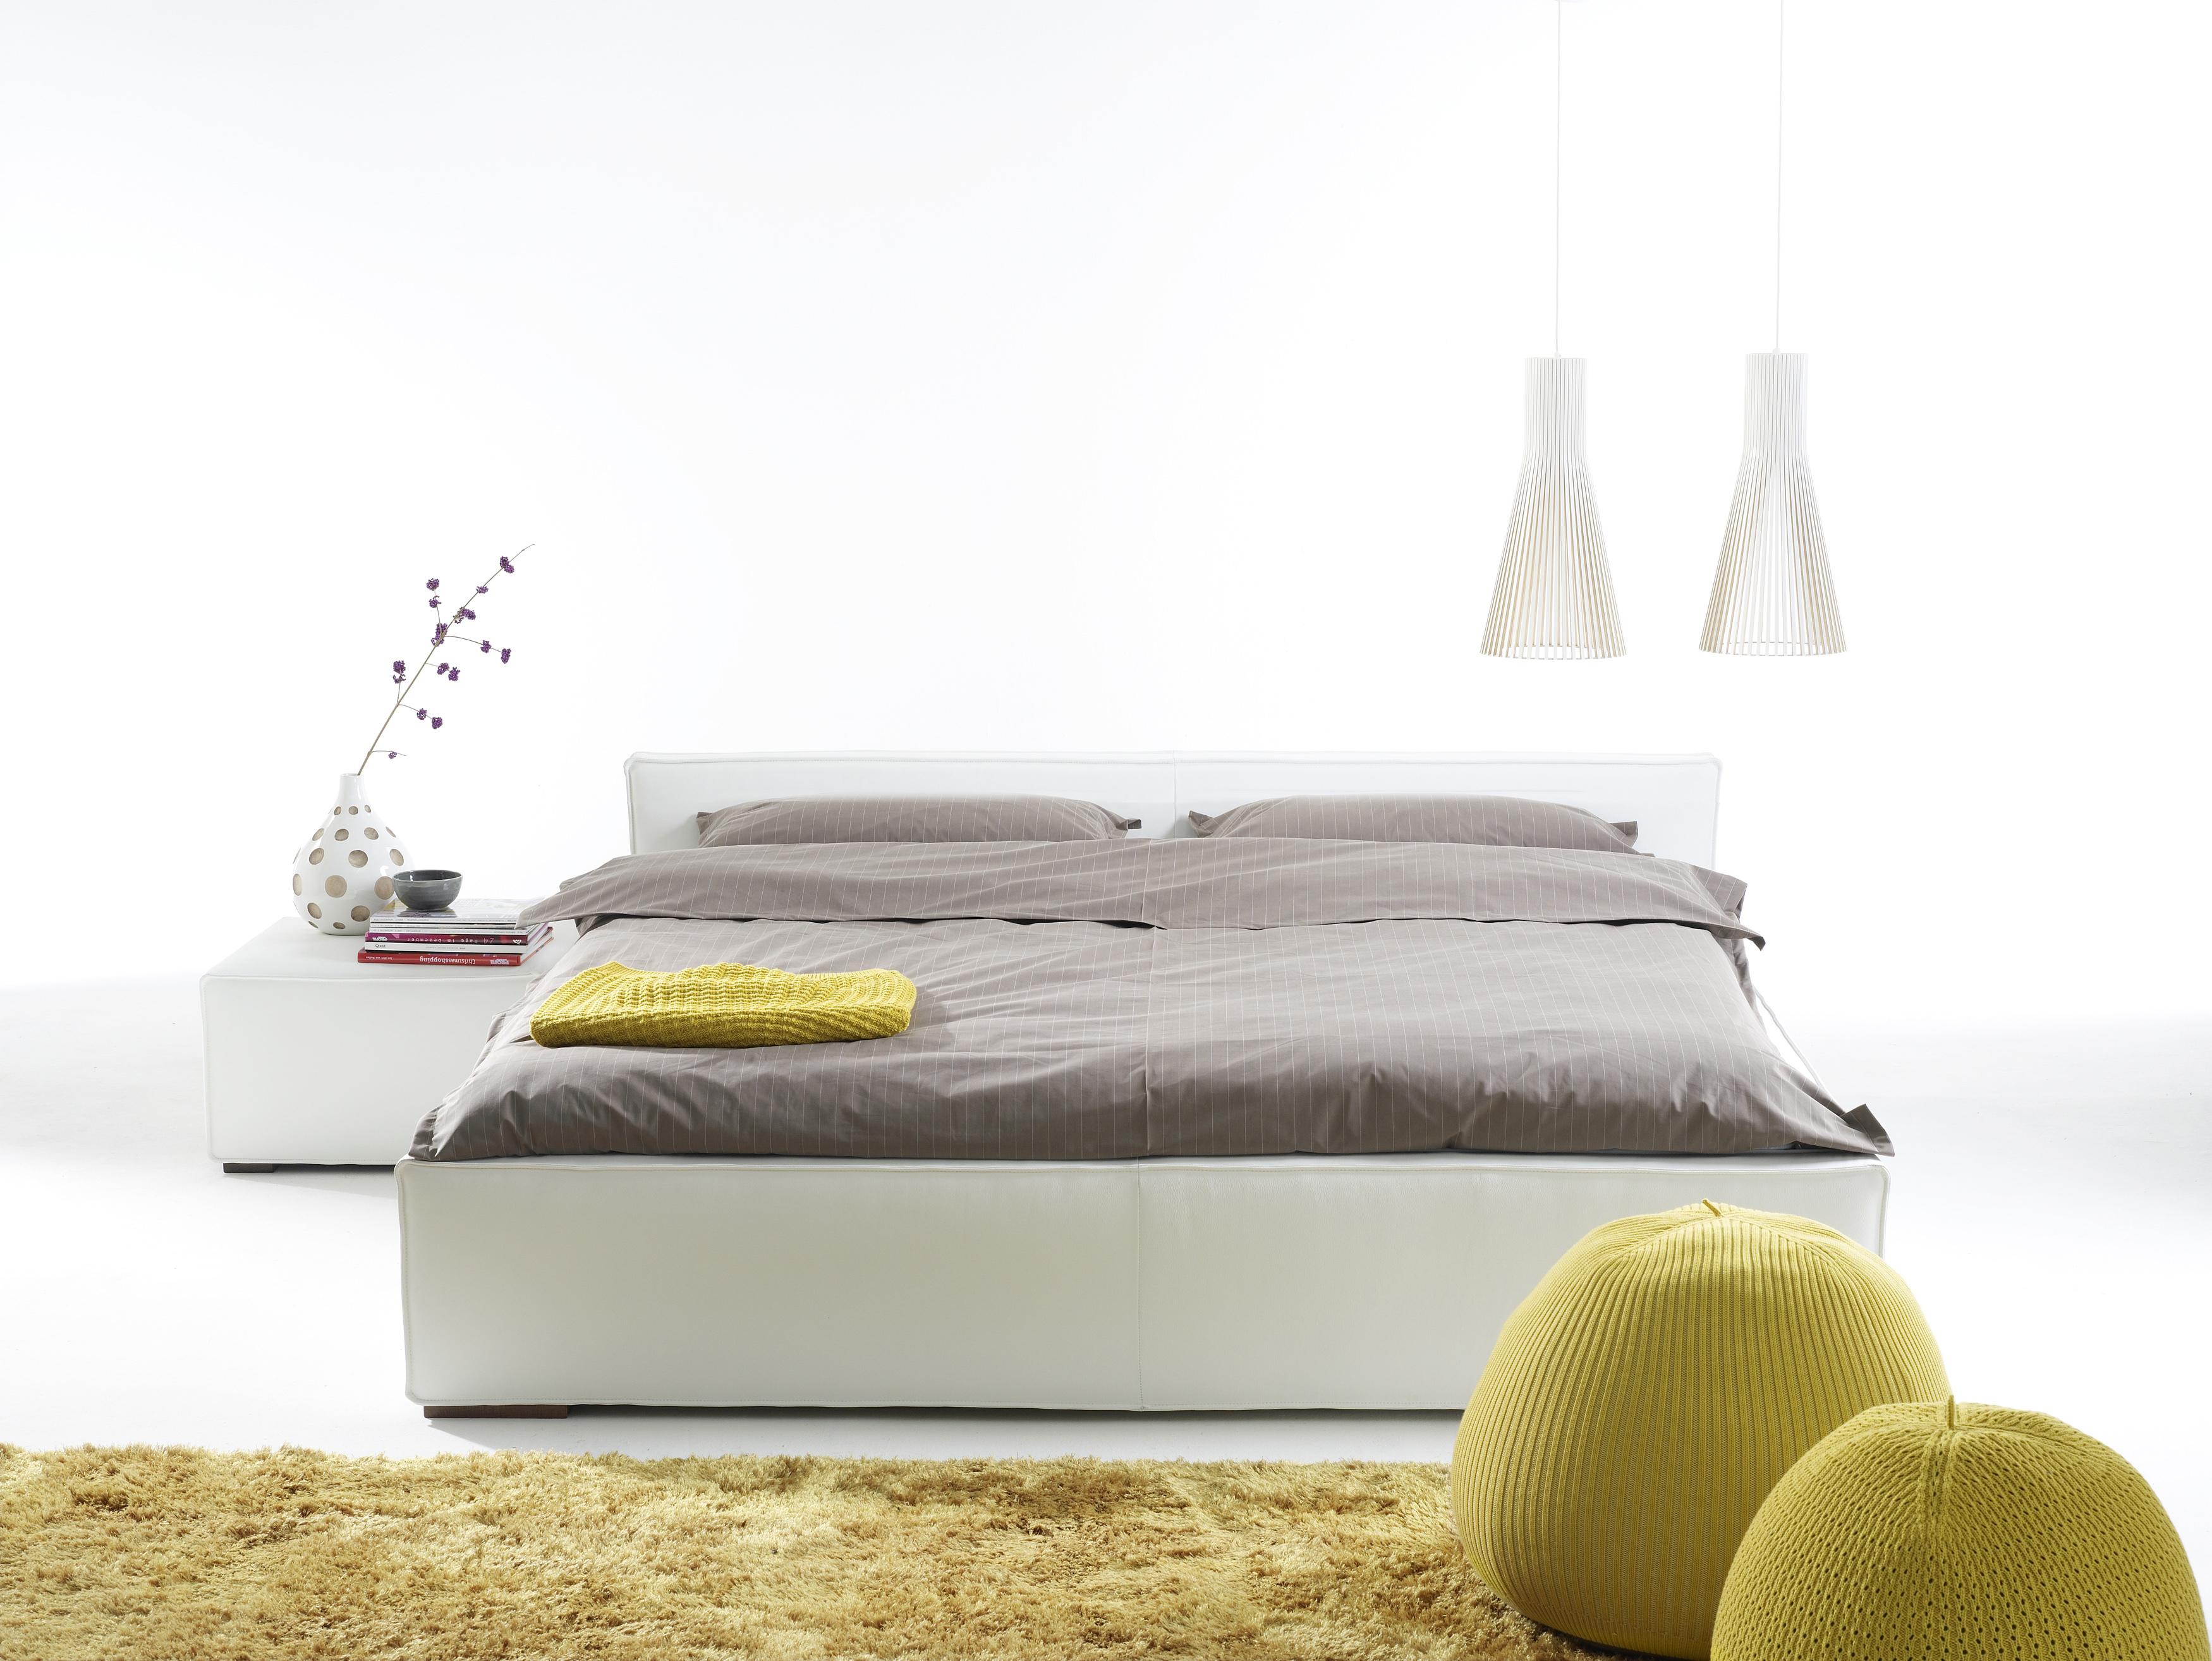 tate von m ller design stylepark. Black Bedroom Furniture Sets. Home Design Ideas